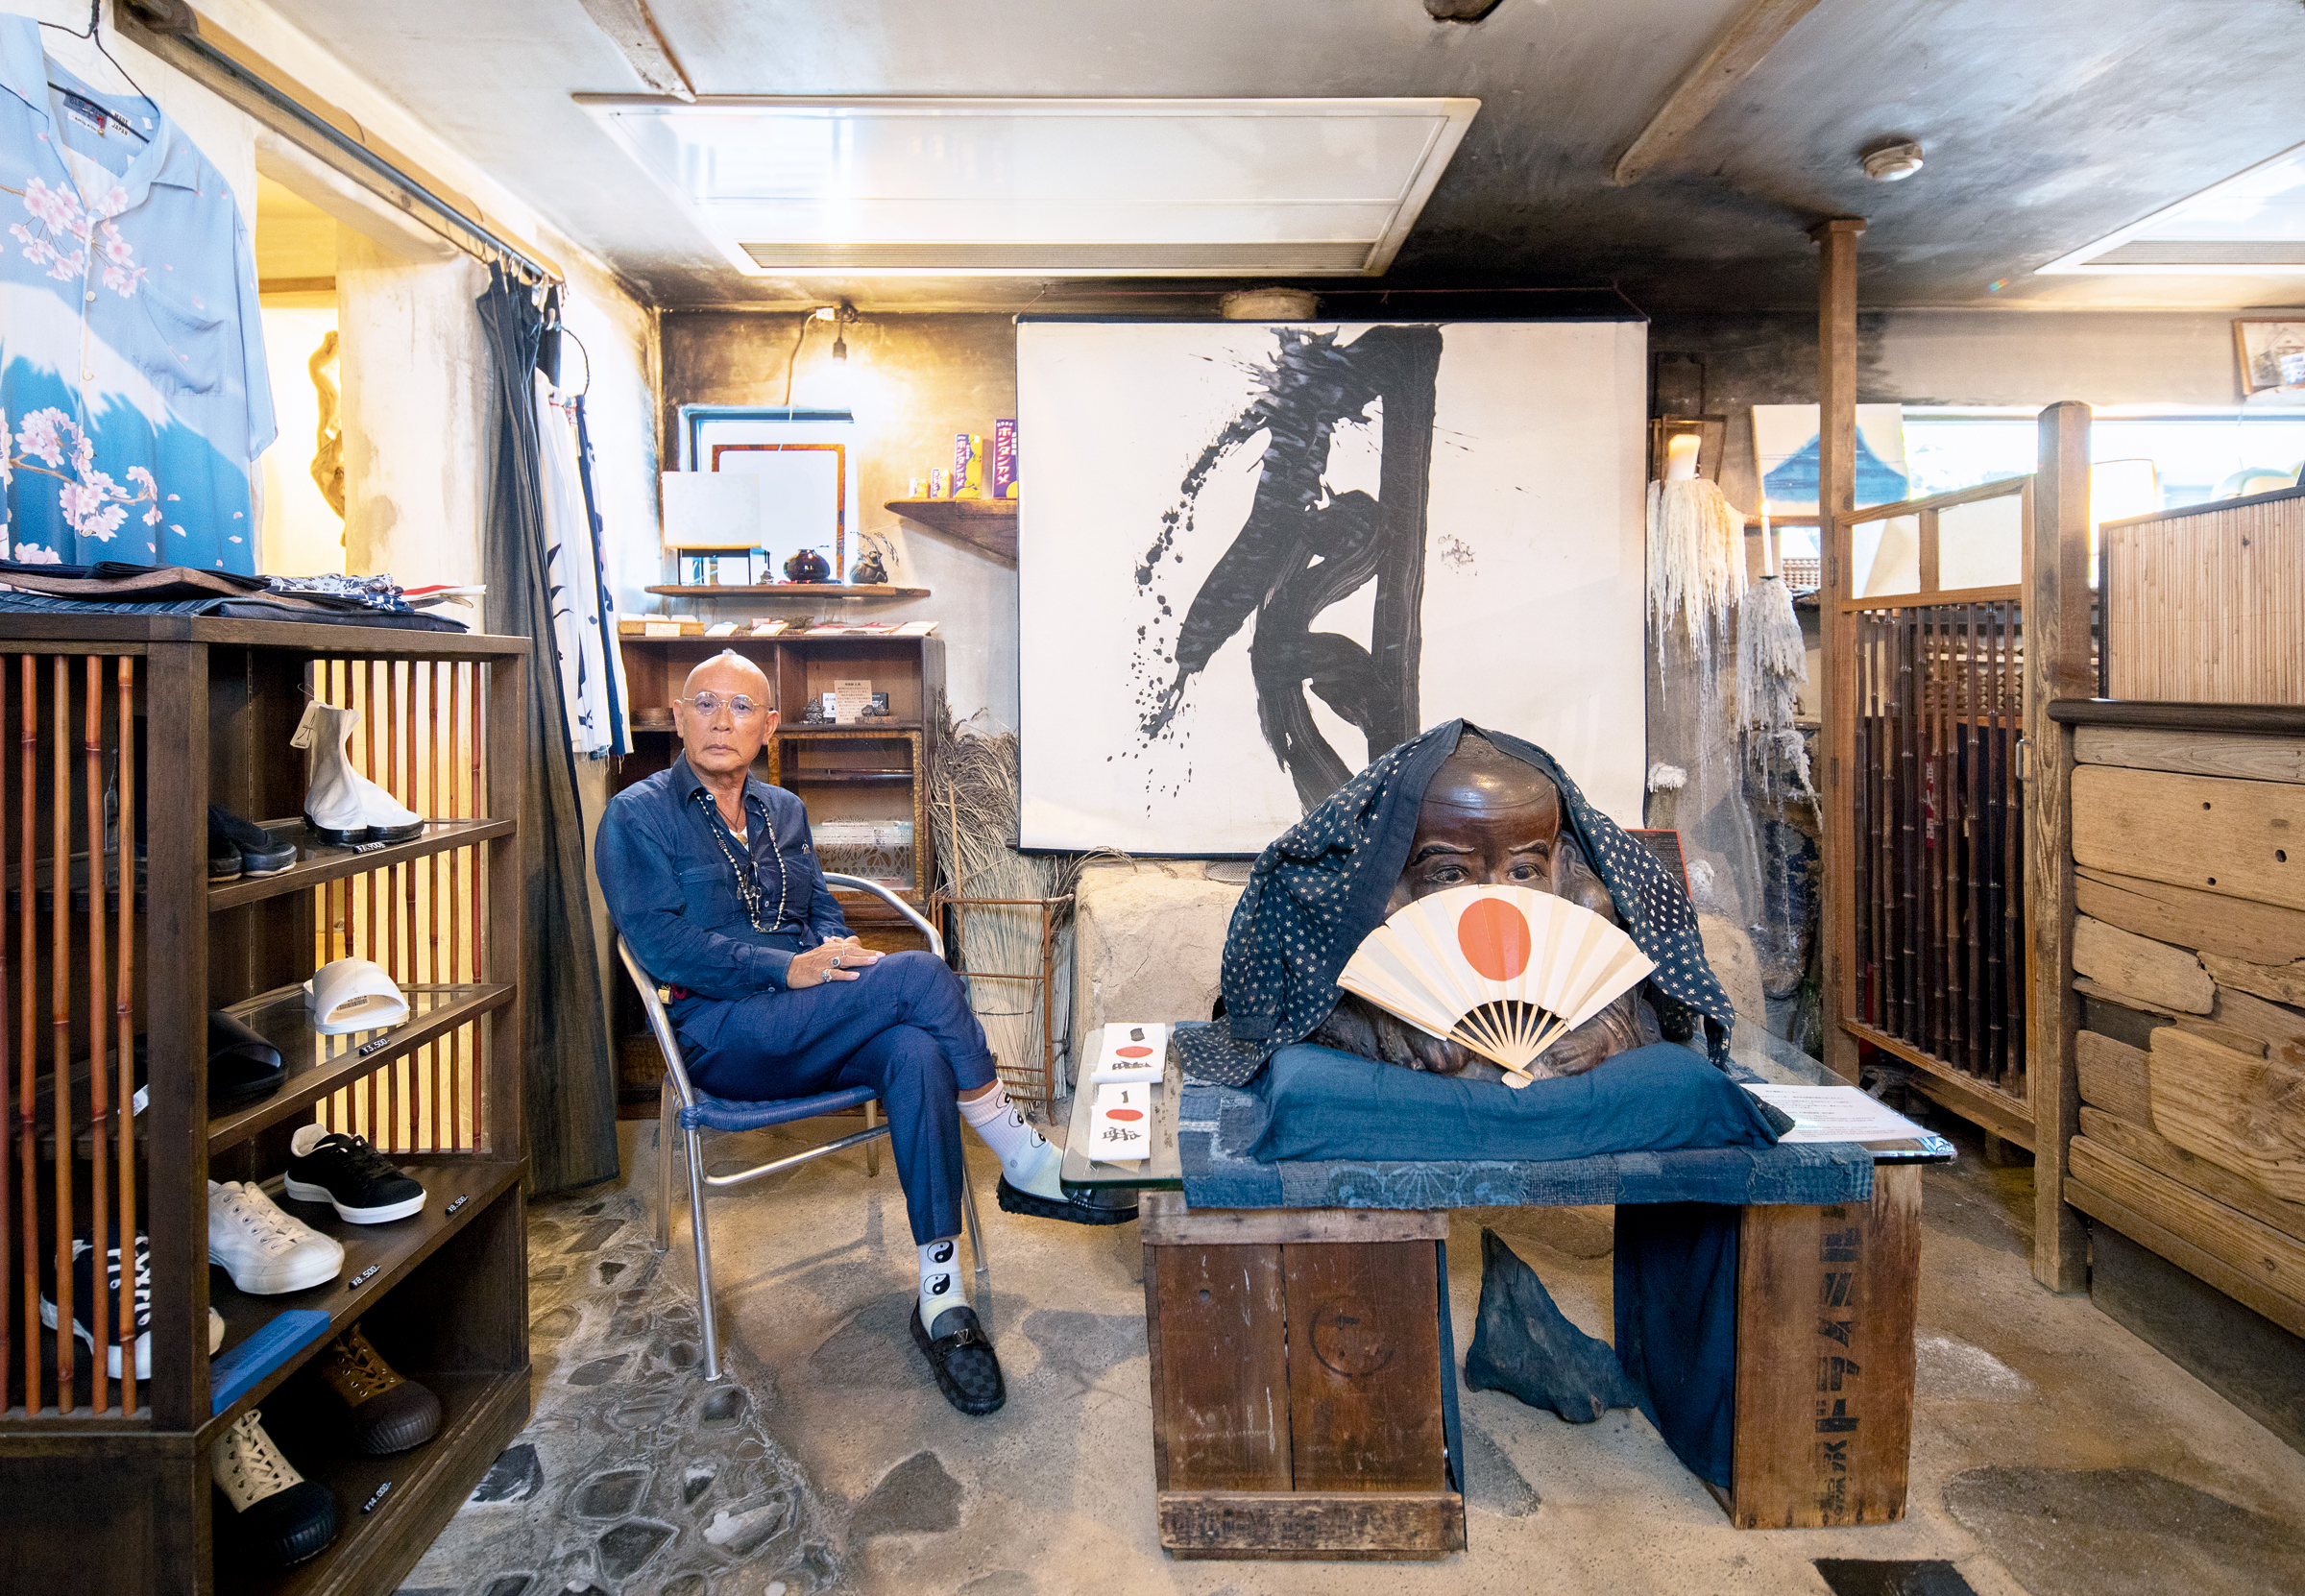 True blue: Tokyo's cult shop for indigo style